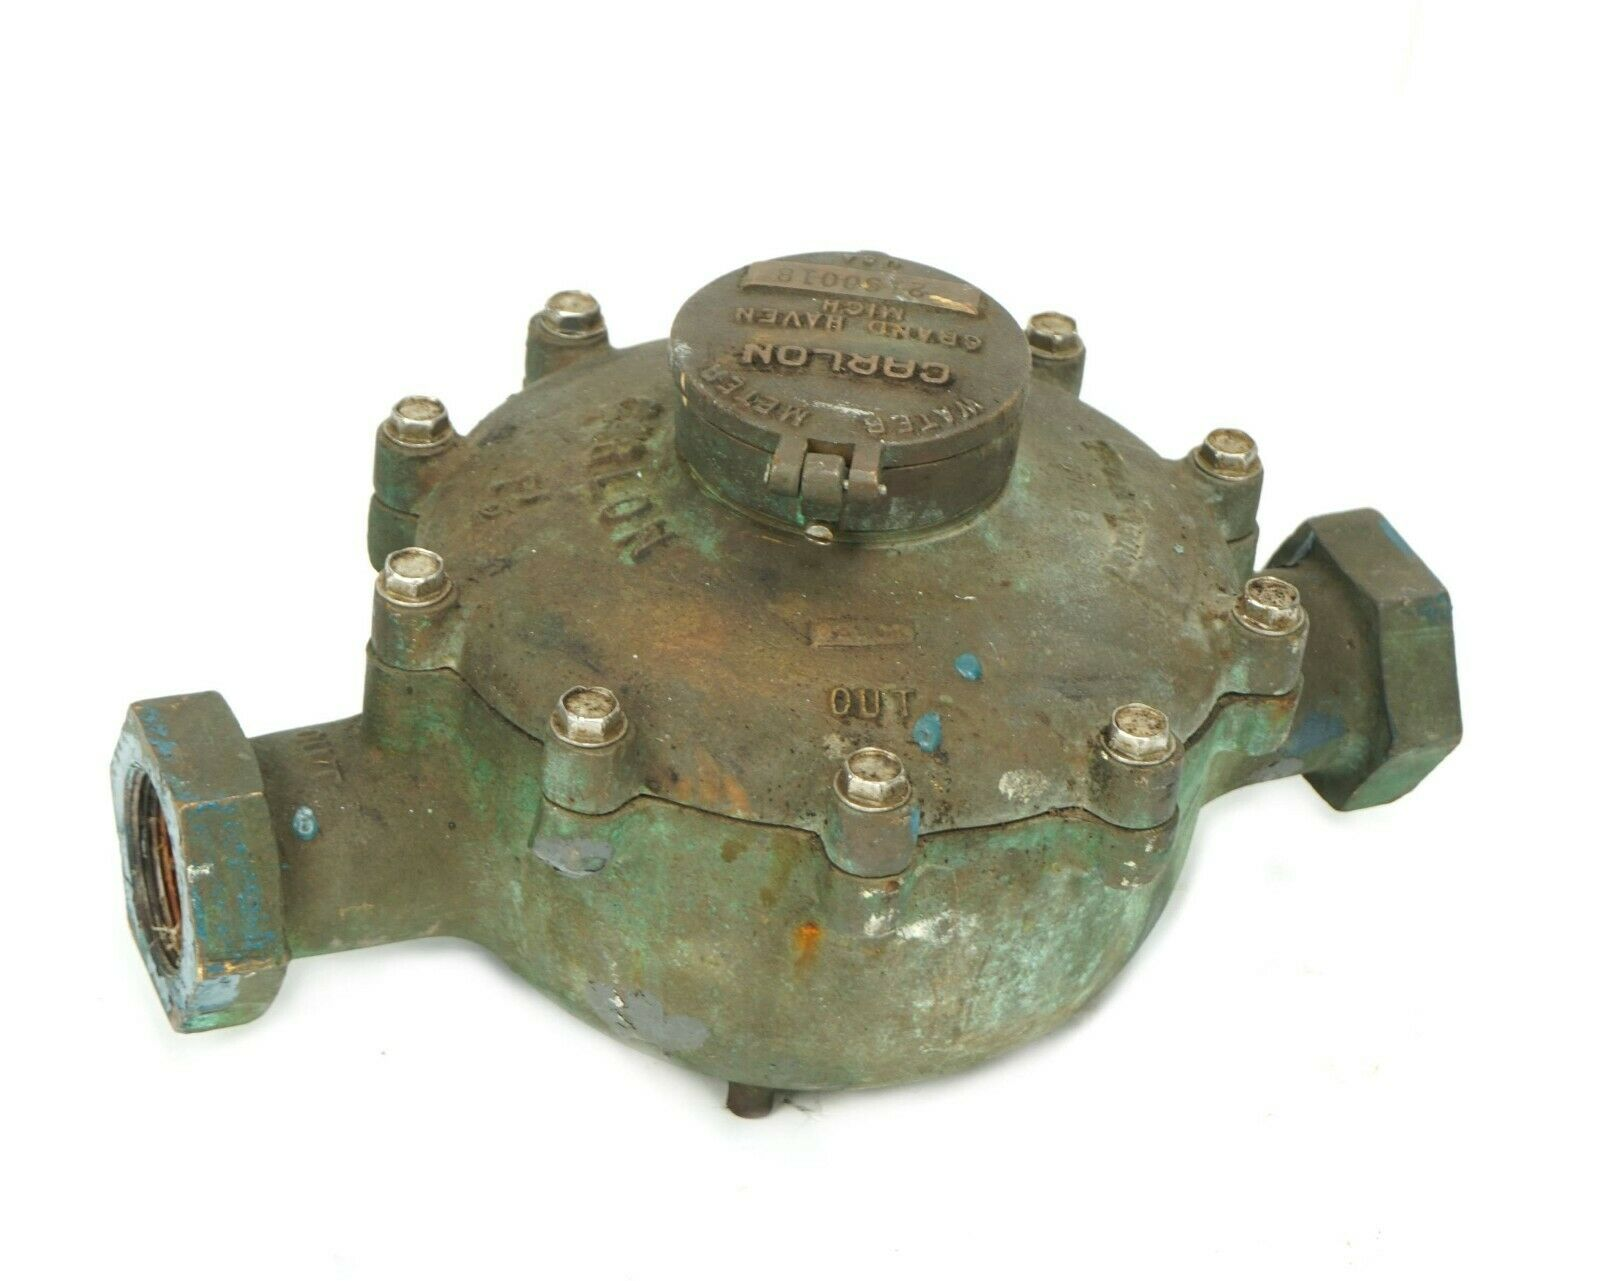 Carlon STD Water Meter